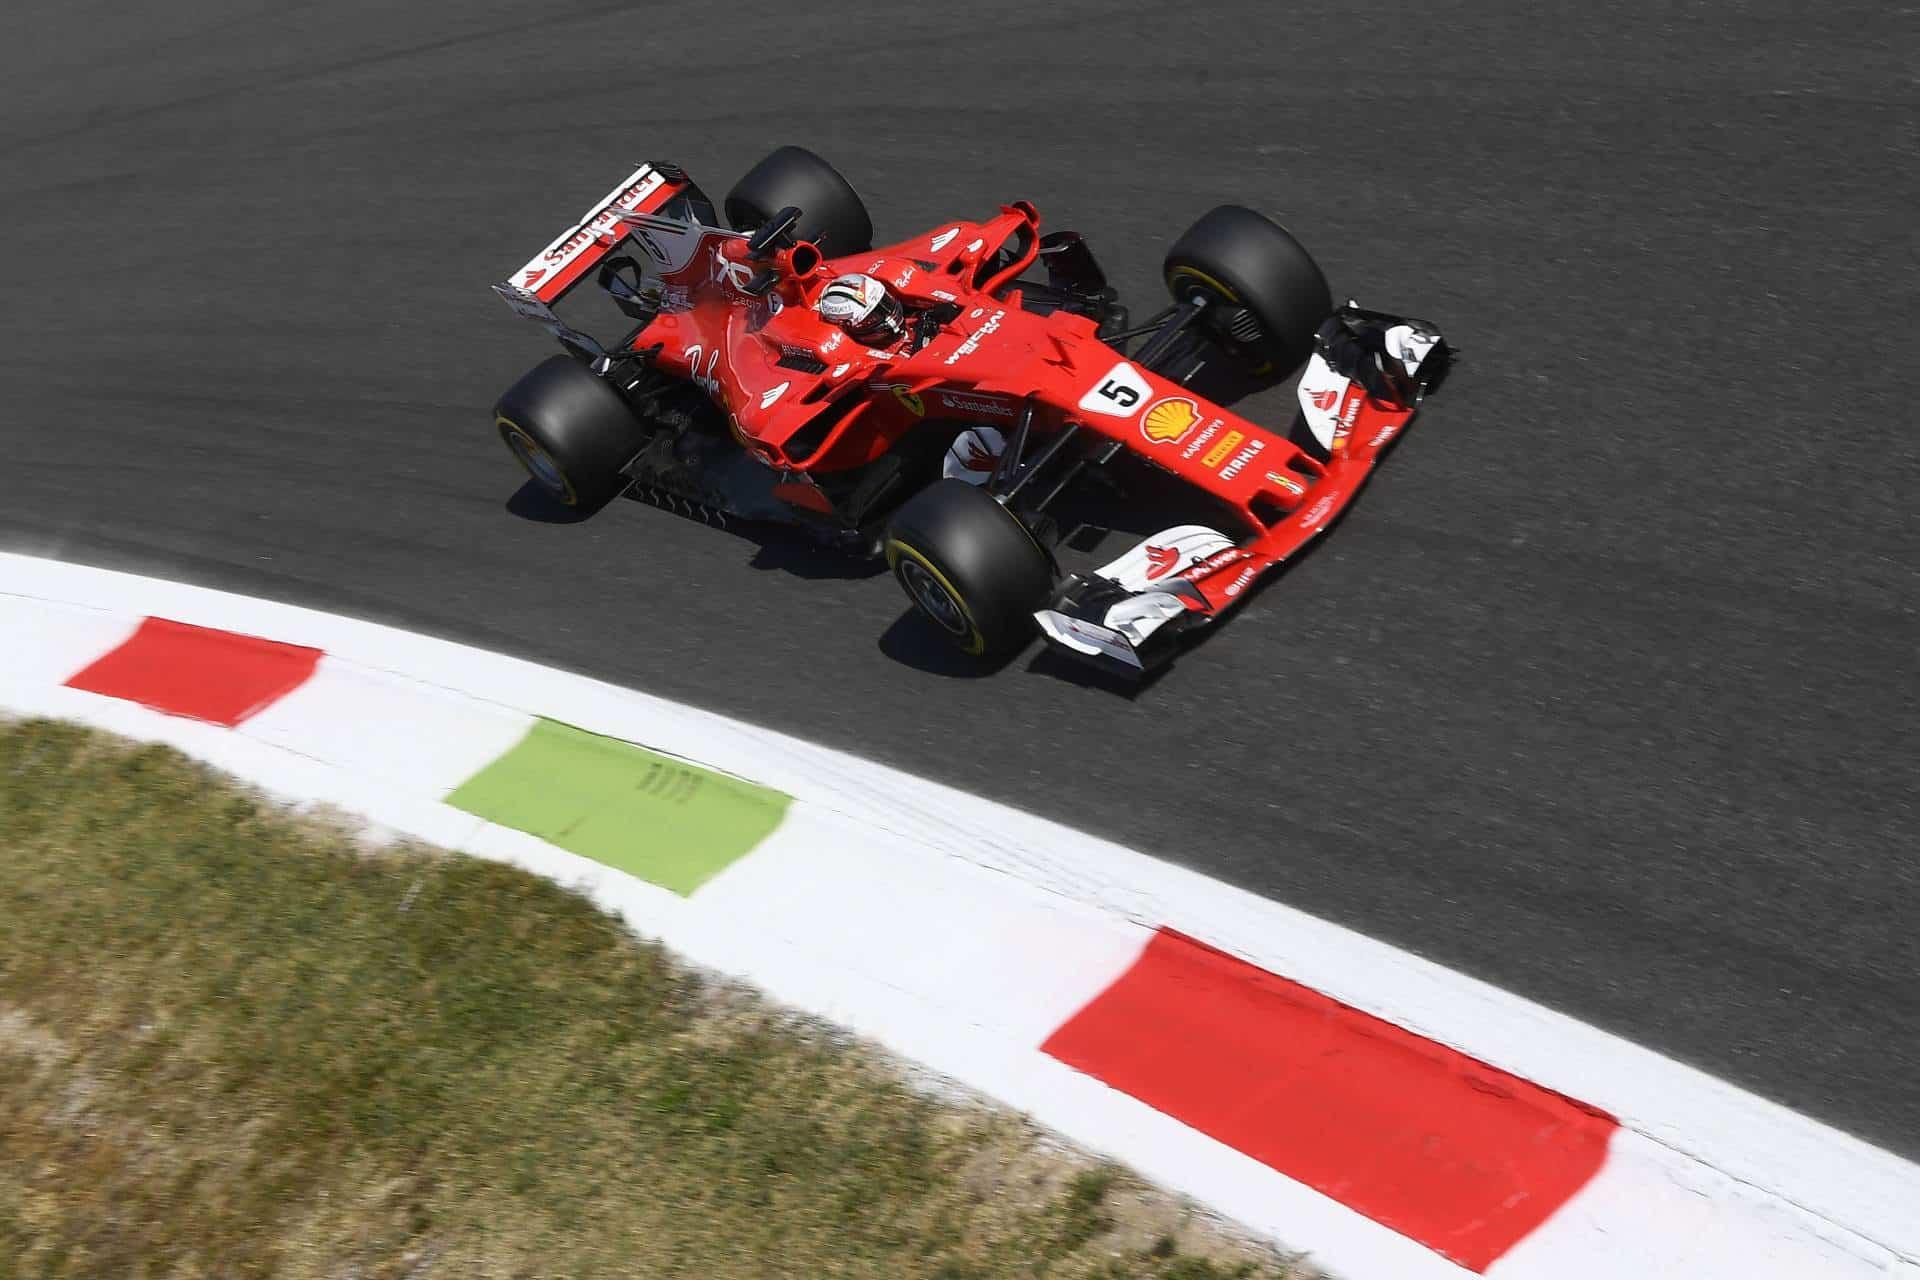 Vettel-Ferrari-SF70H-Italian-GP-F1-2017-Monza-Parabolica-Photo-Ferrari